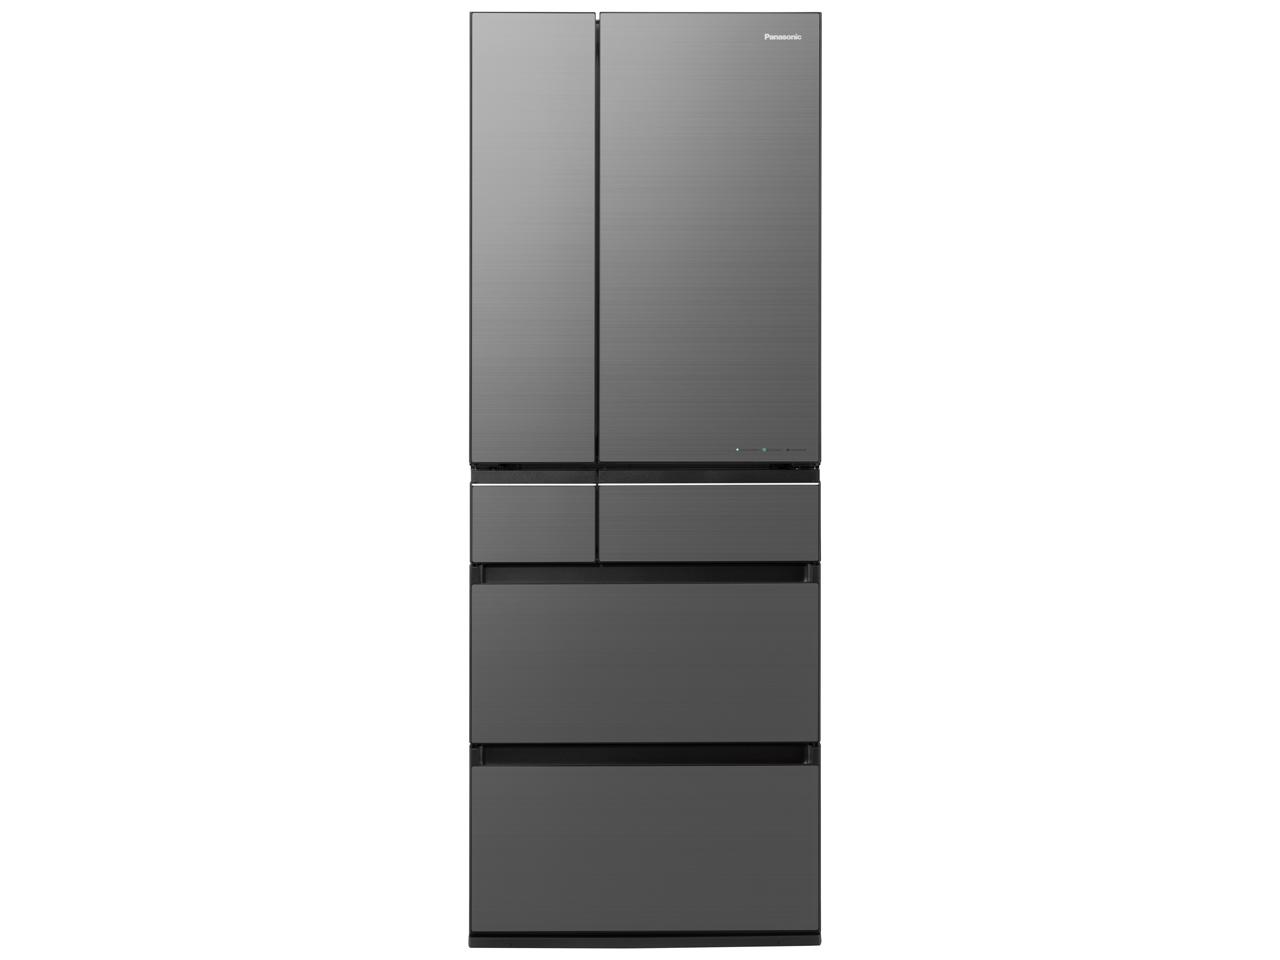 NR-F605WPX-H パナソニック600L冷蔵庫